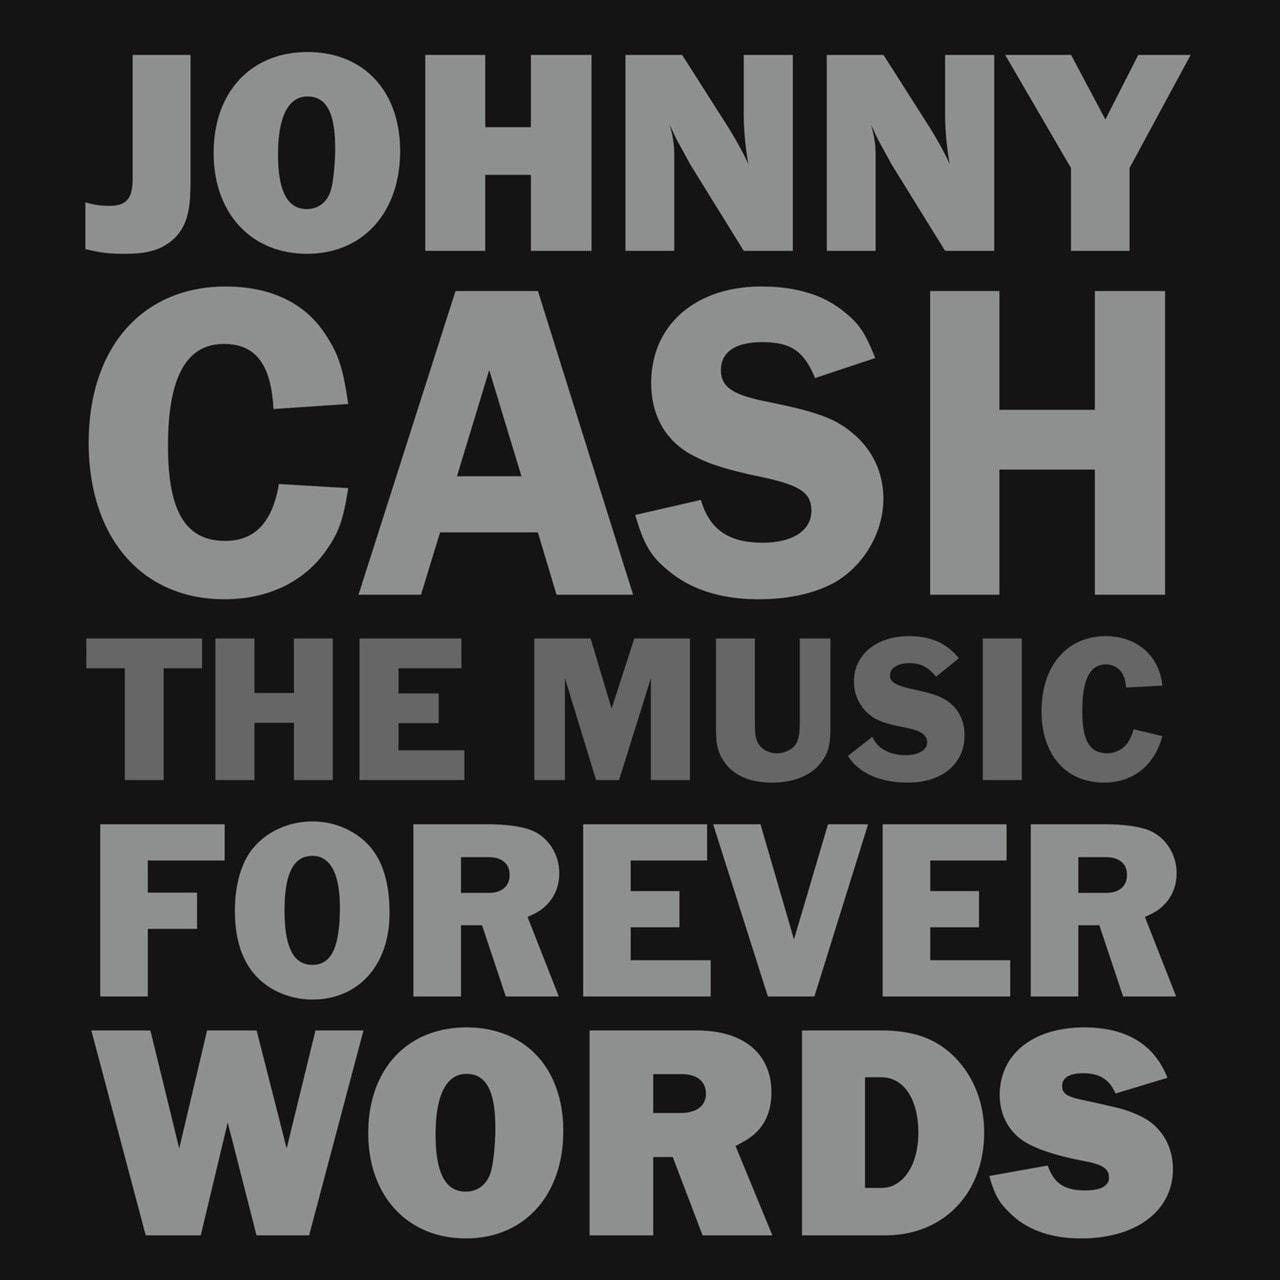 Johnny Cash: Forever Words - 1